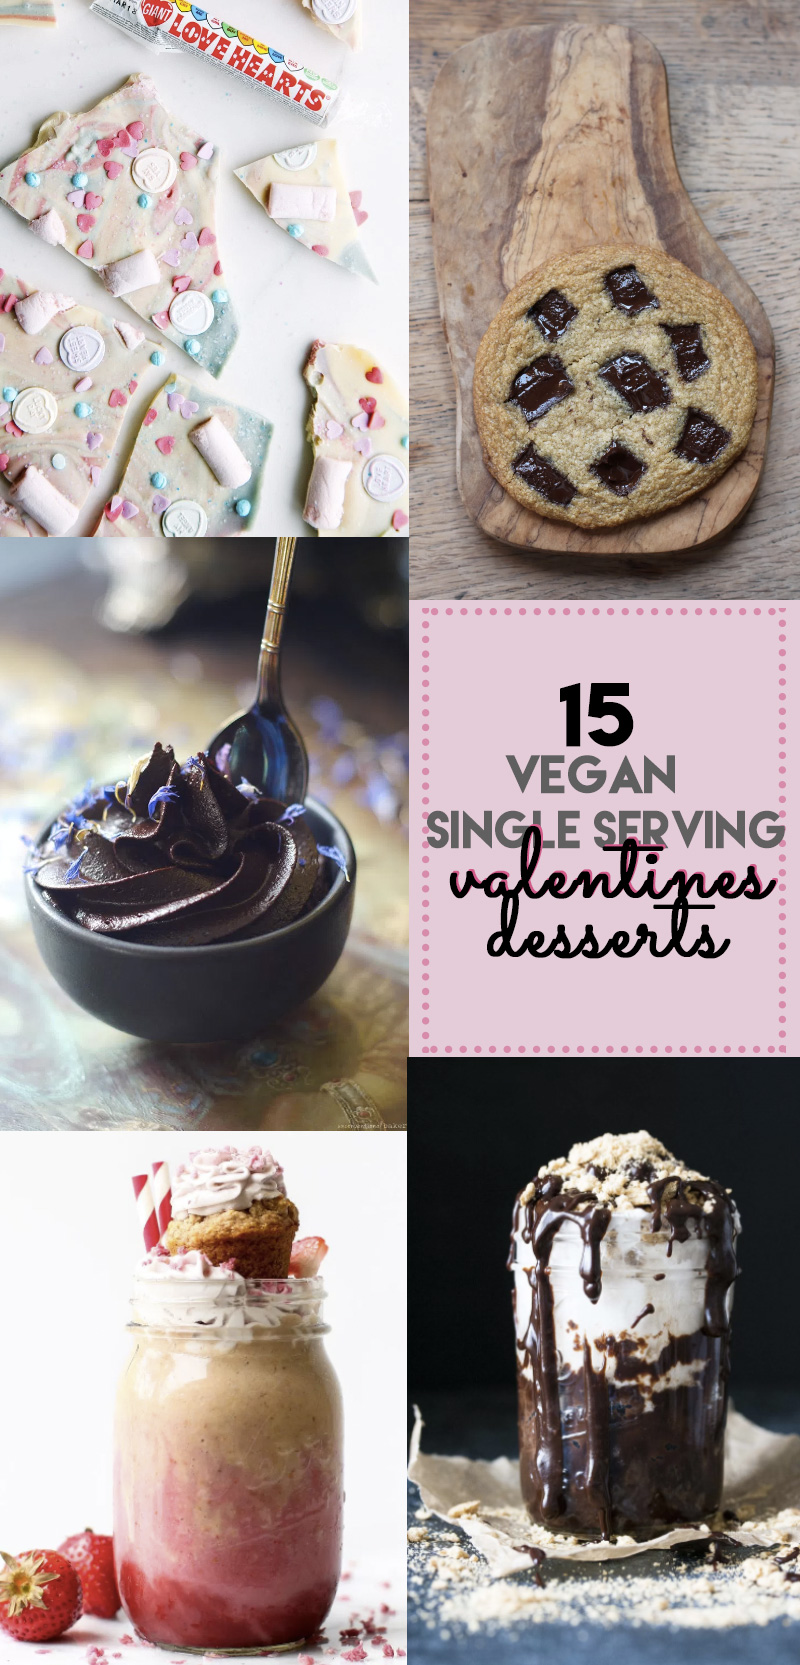 15 Vegan Single Lady Valentine's Desserts | love me, feed me